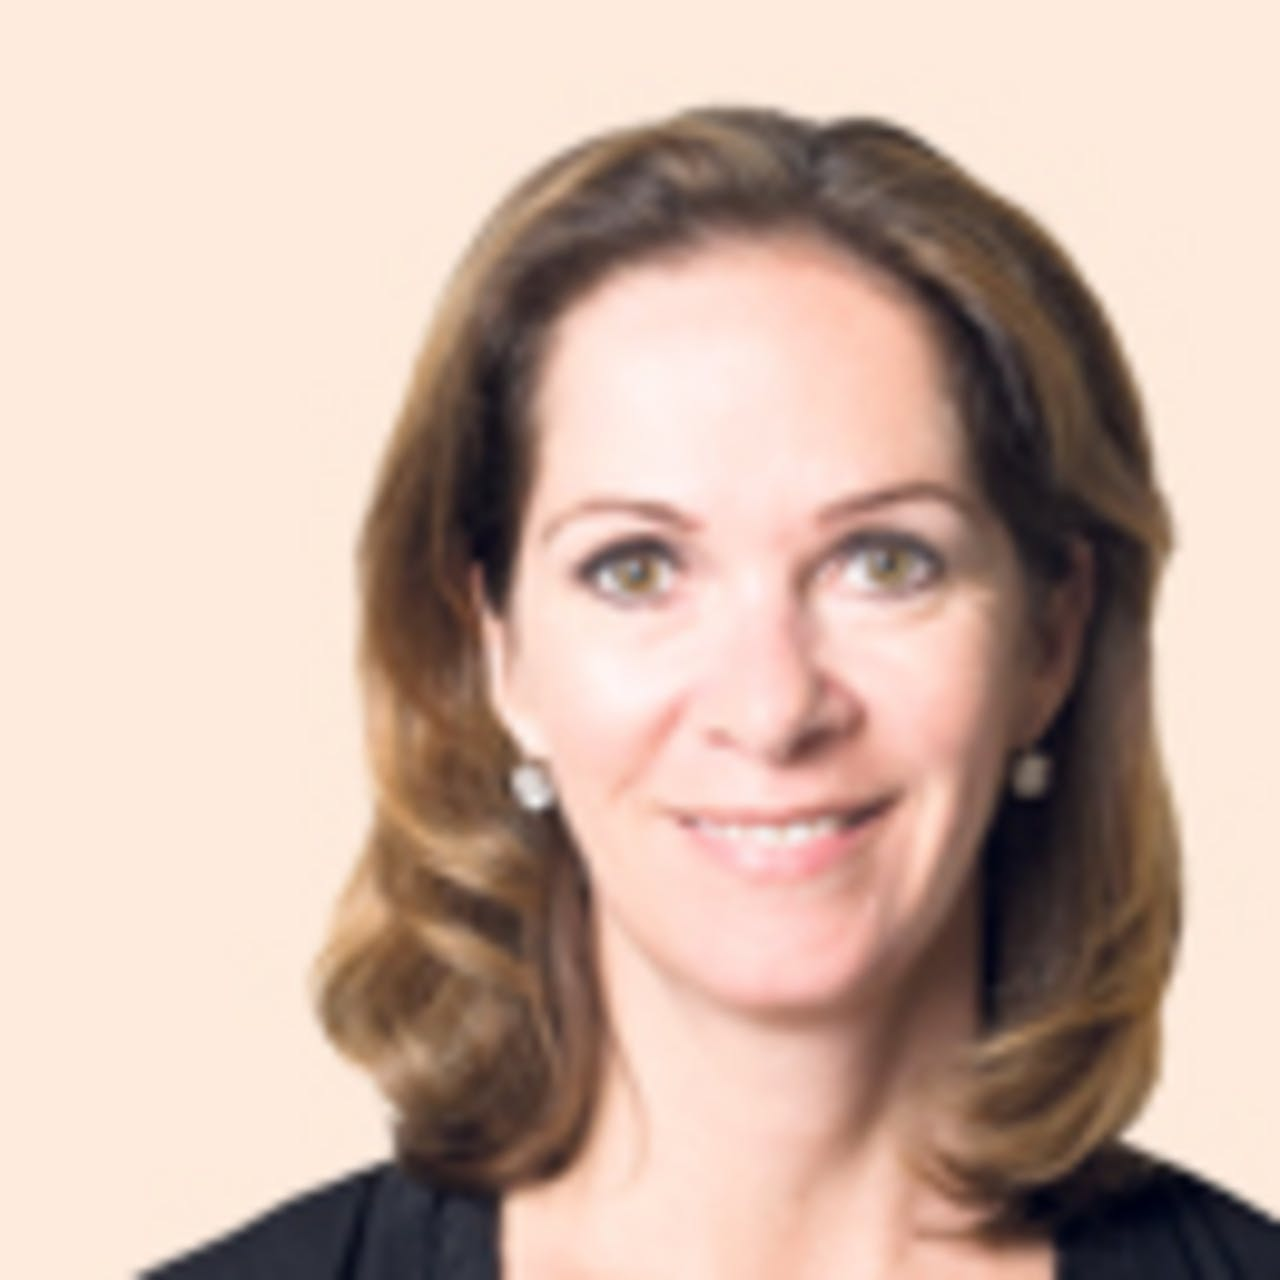 Anne Marie Briest gevallen held